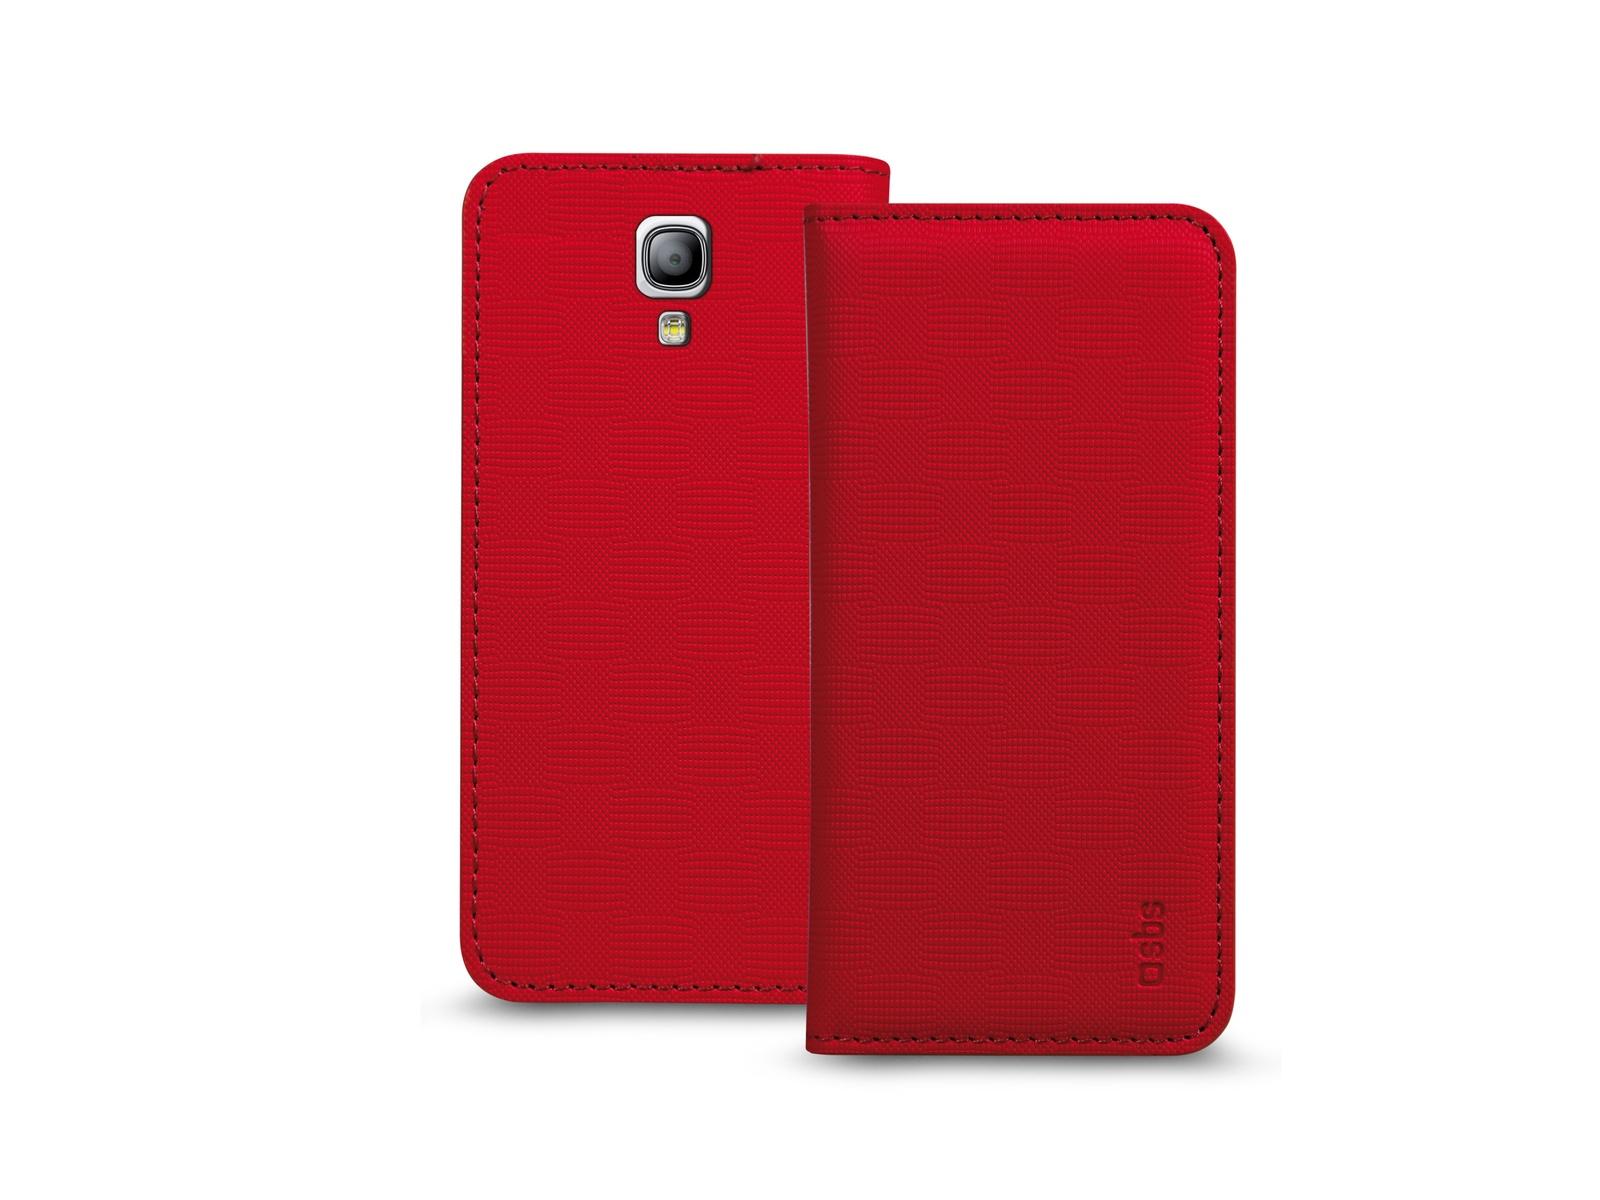 Чехол-книжка SBS для Samsung Galaxy S4 Mini (Bookstyle, красный)